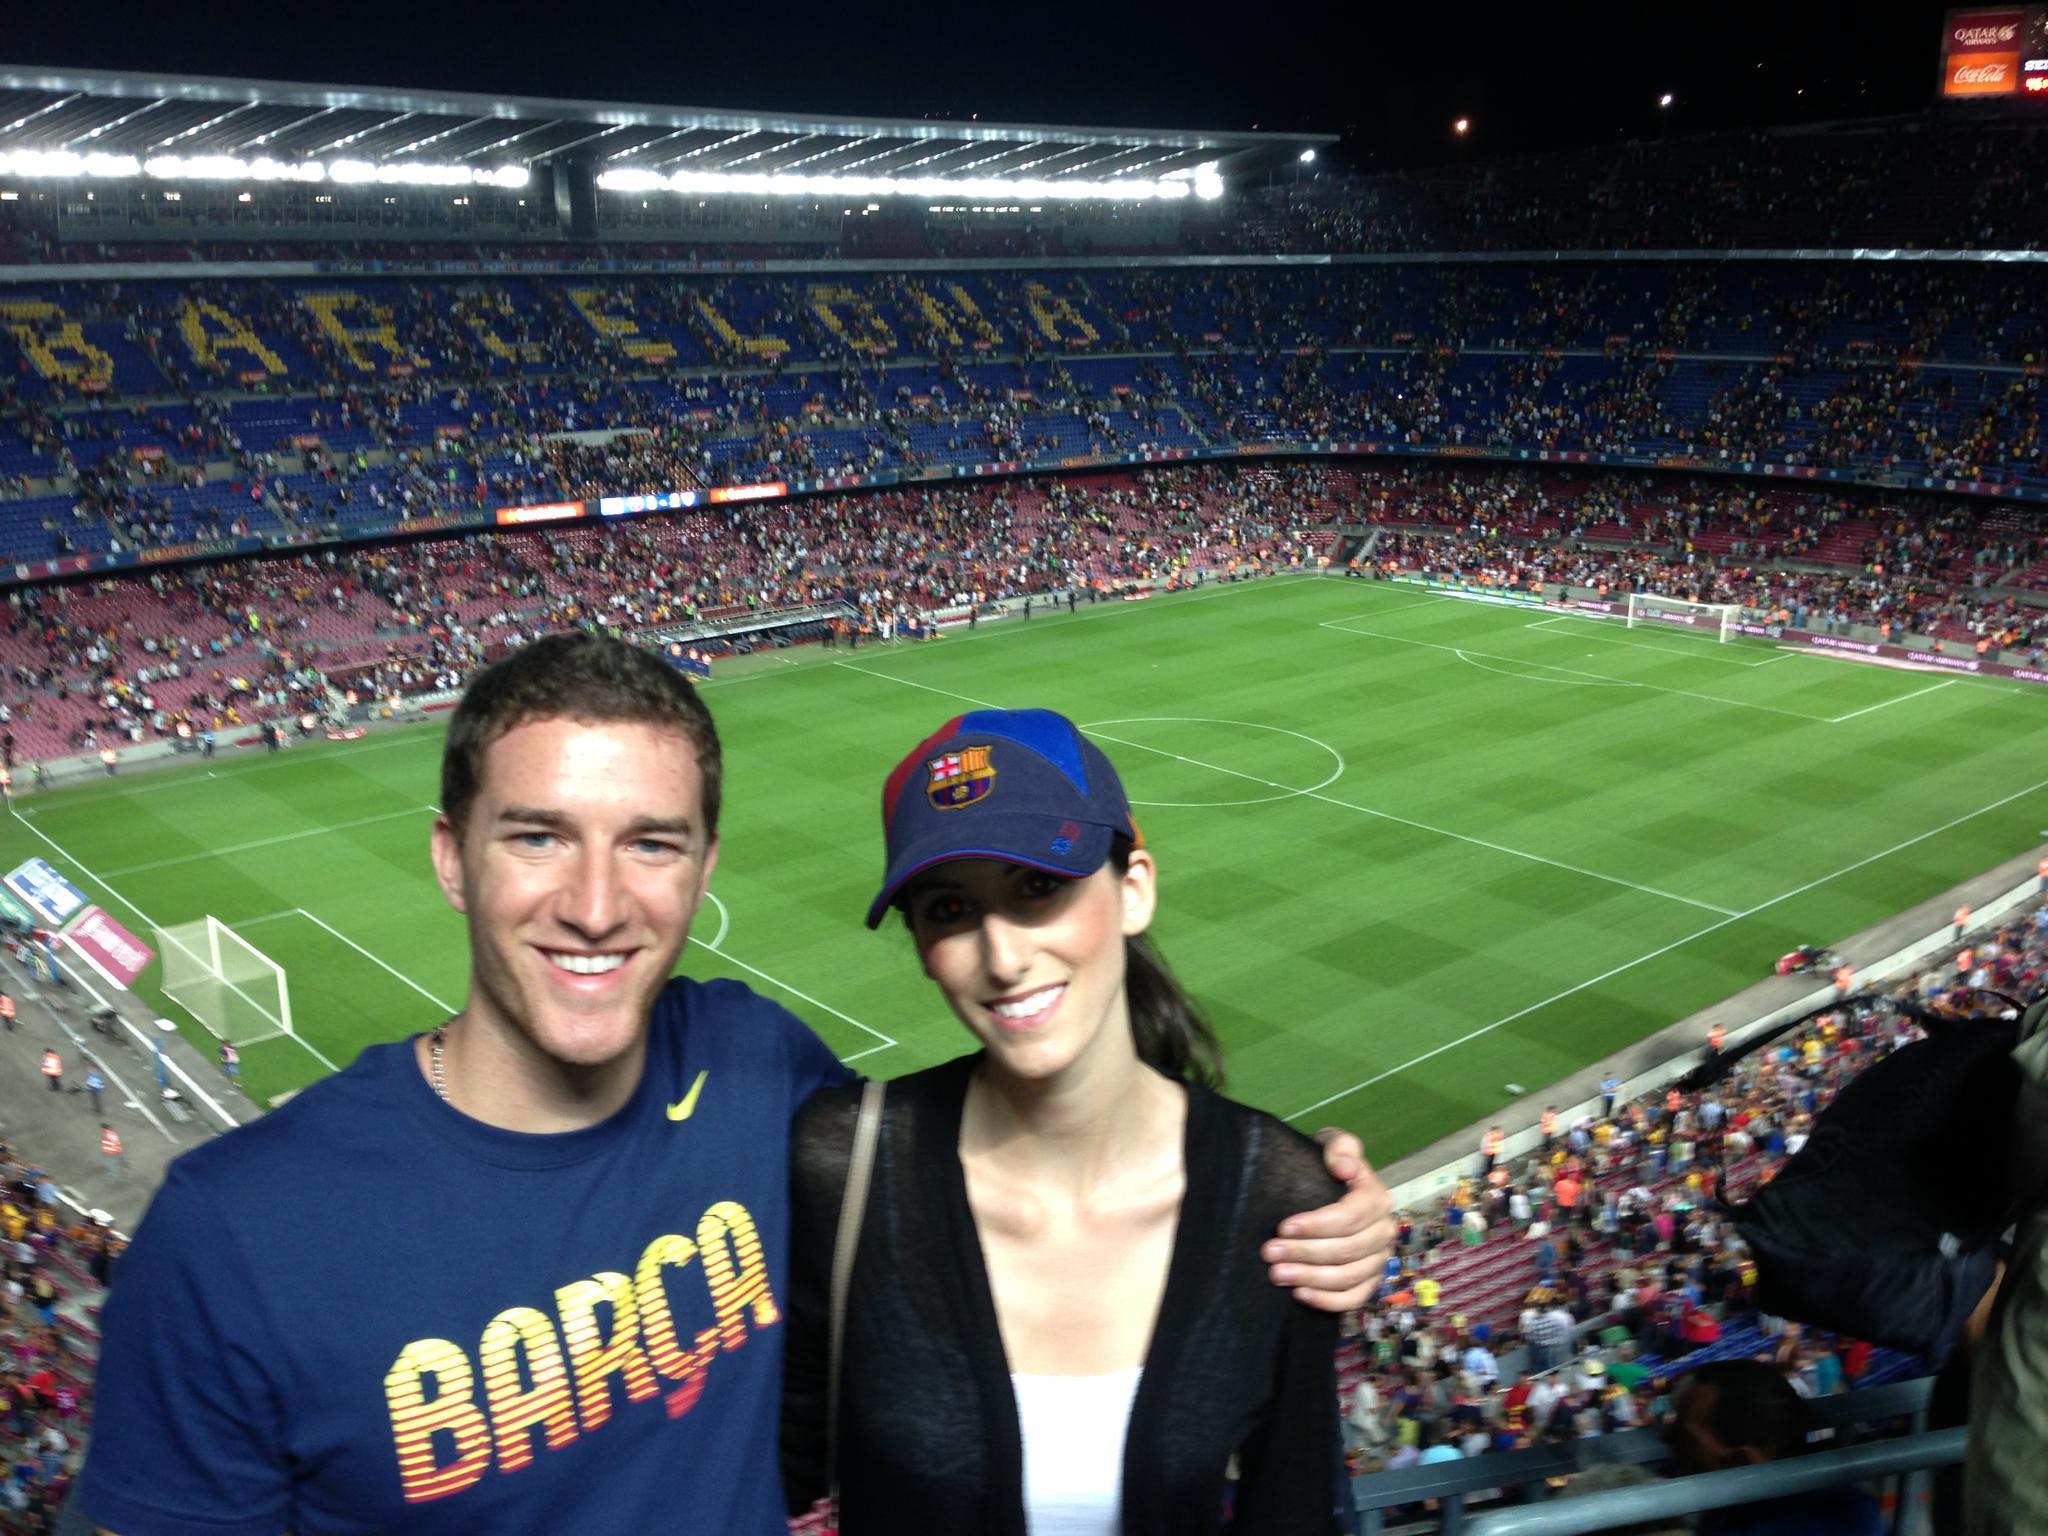 FC Barcelona match at Camp Nou - Barcelona, Spain